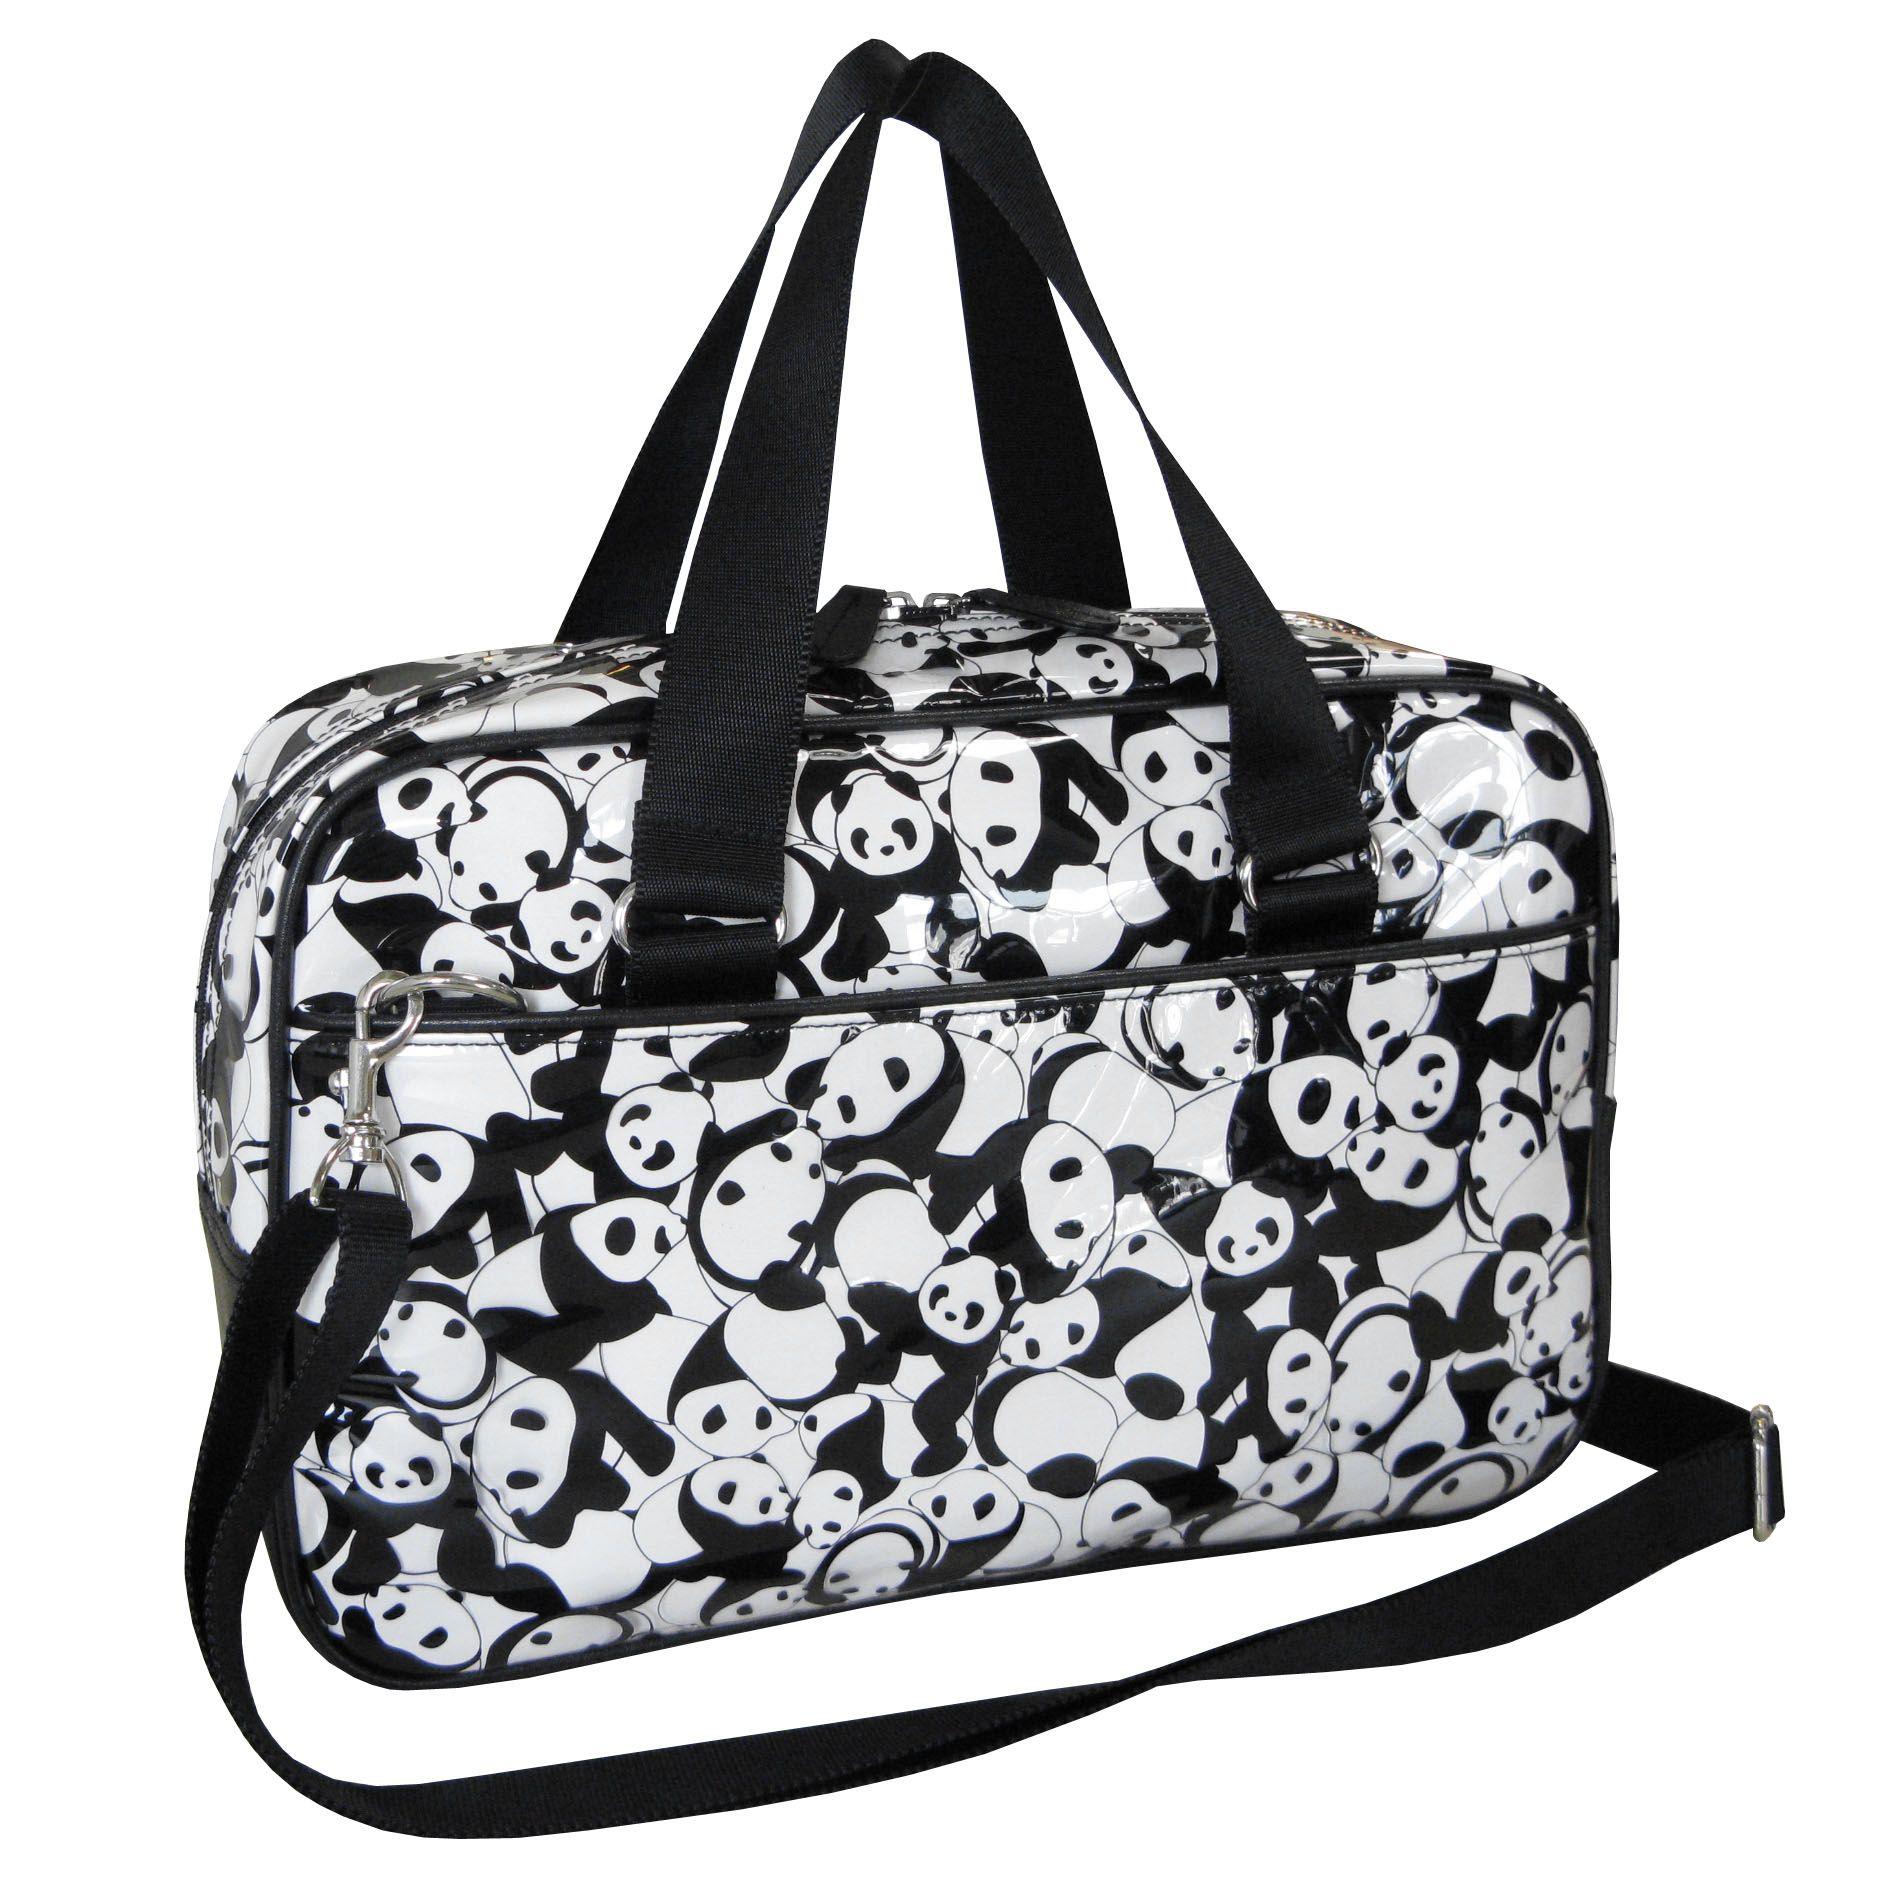 Panda Luggage